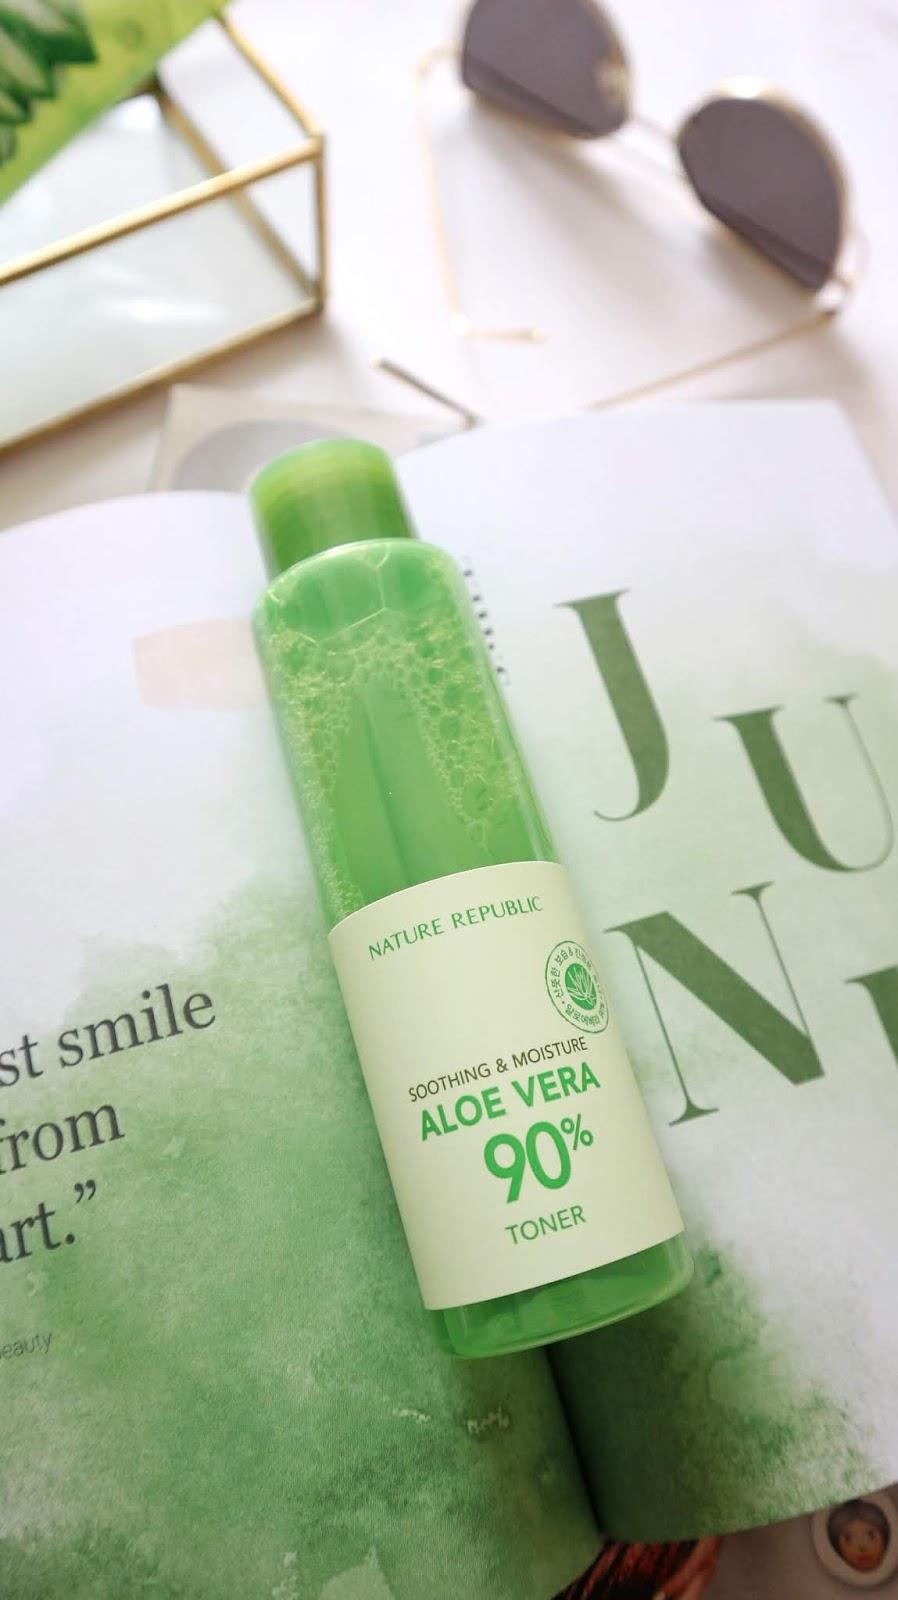 Nature Republic Soothing & Moisture Aloe Vera 90% Toner